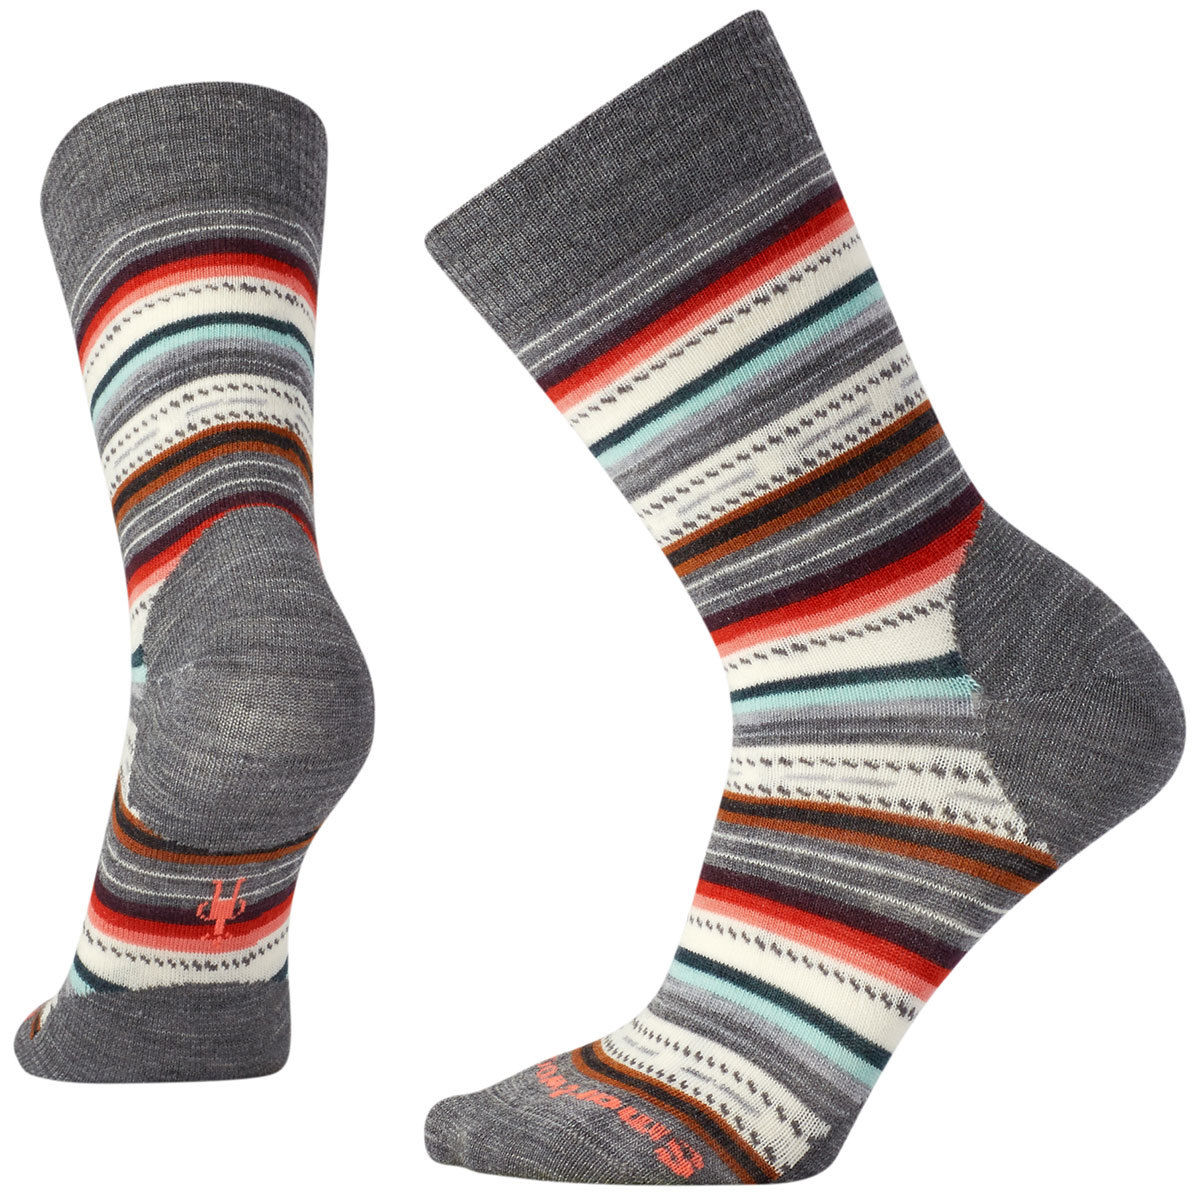 Smartwool Women's Margarita Socks - Black, M